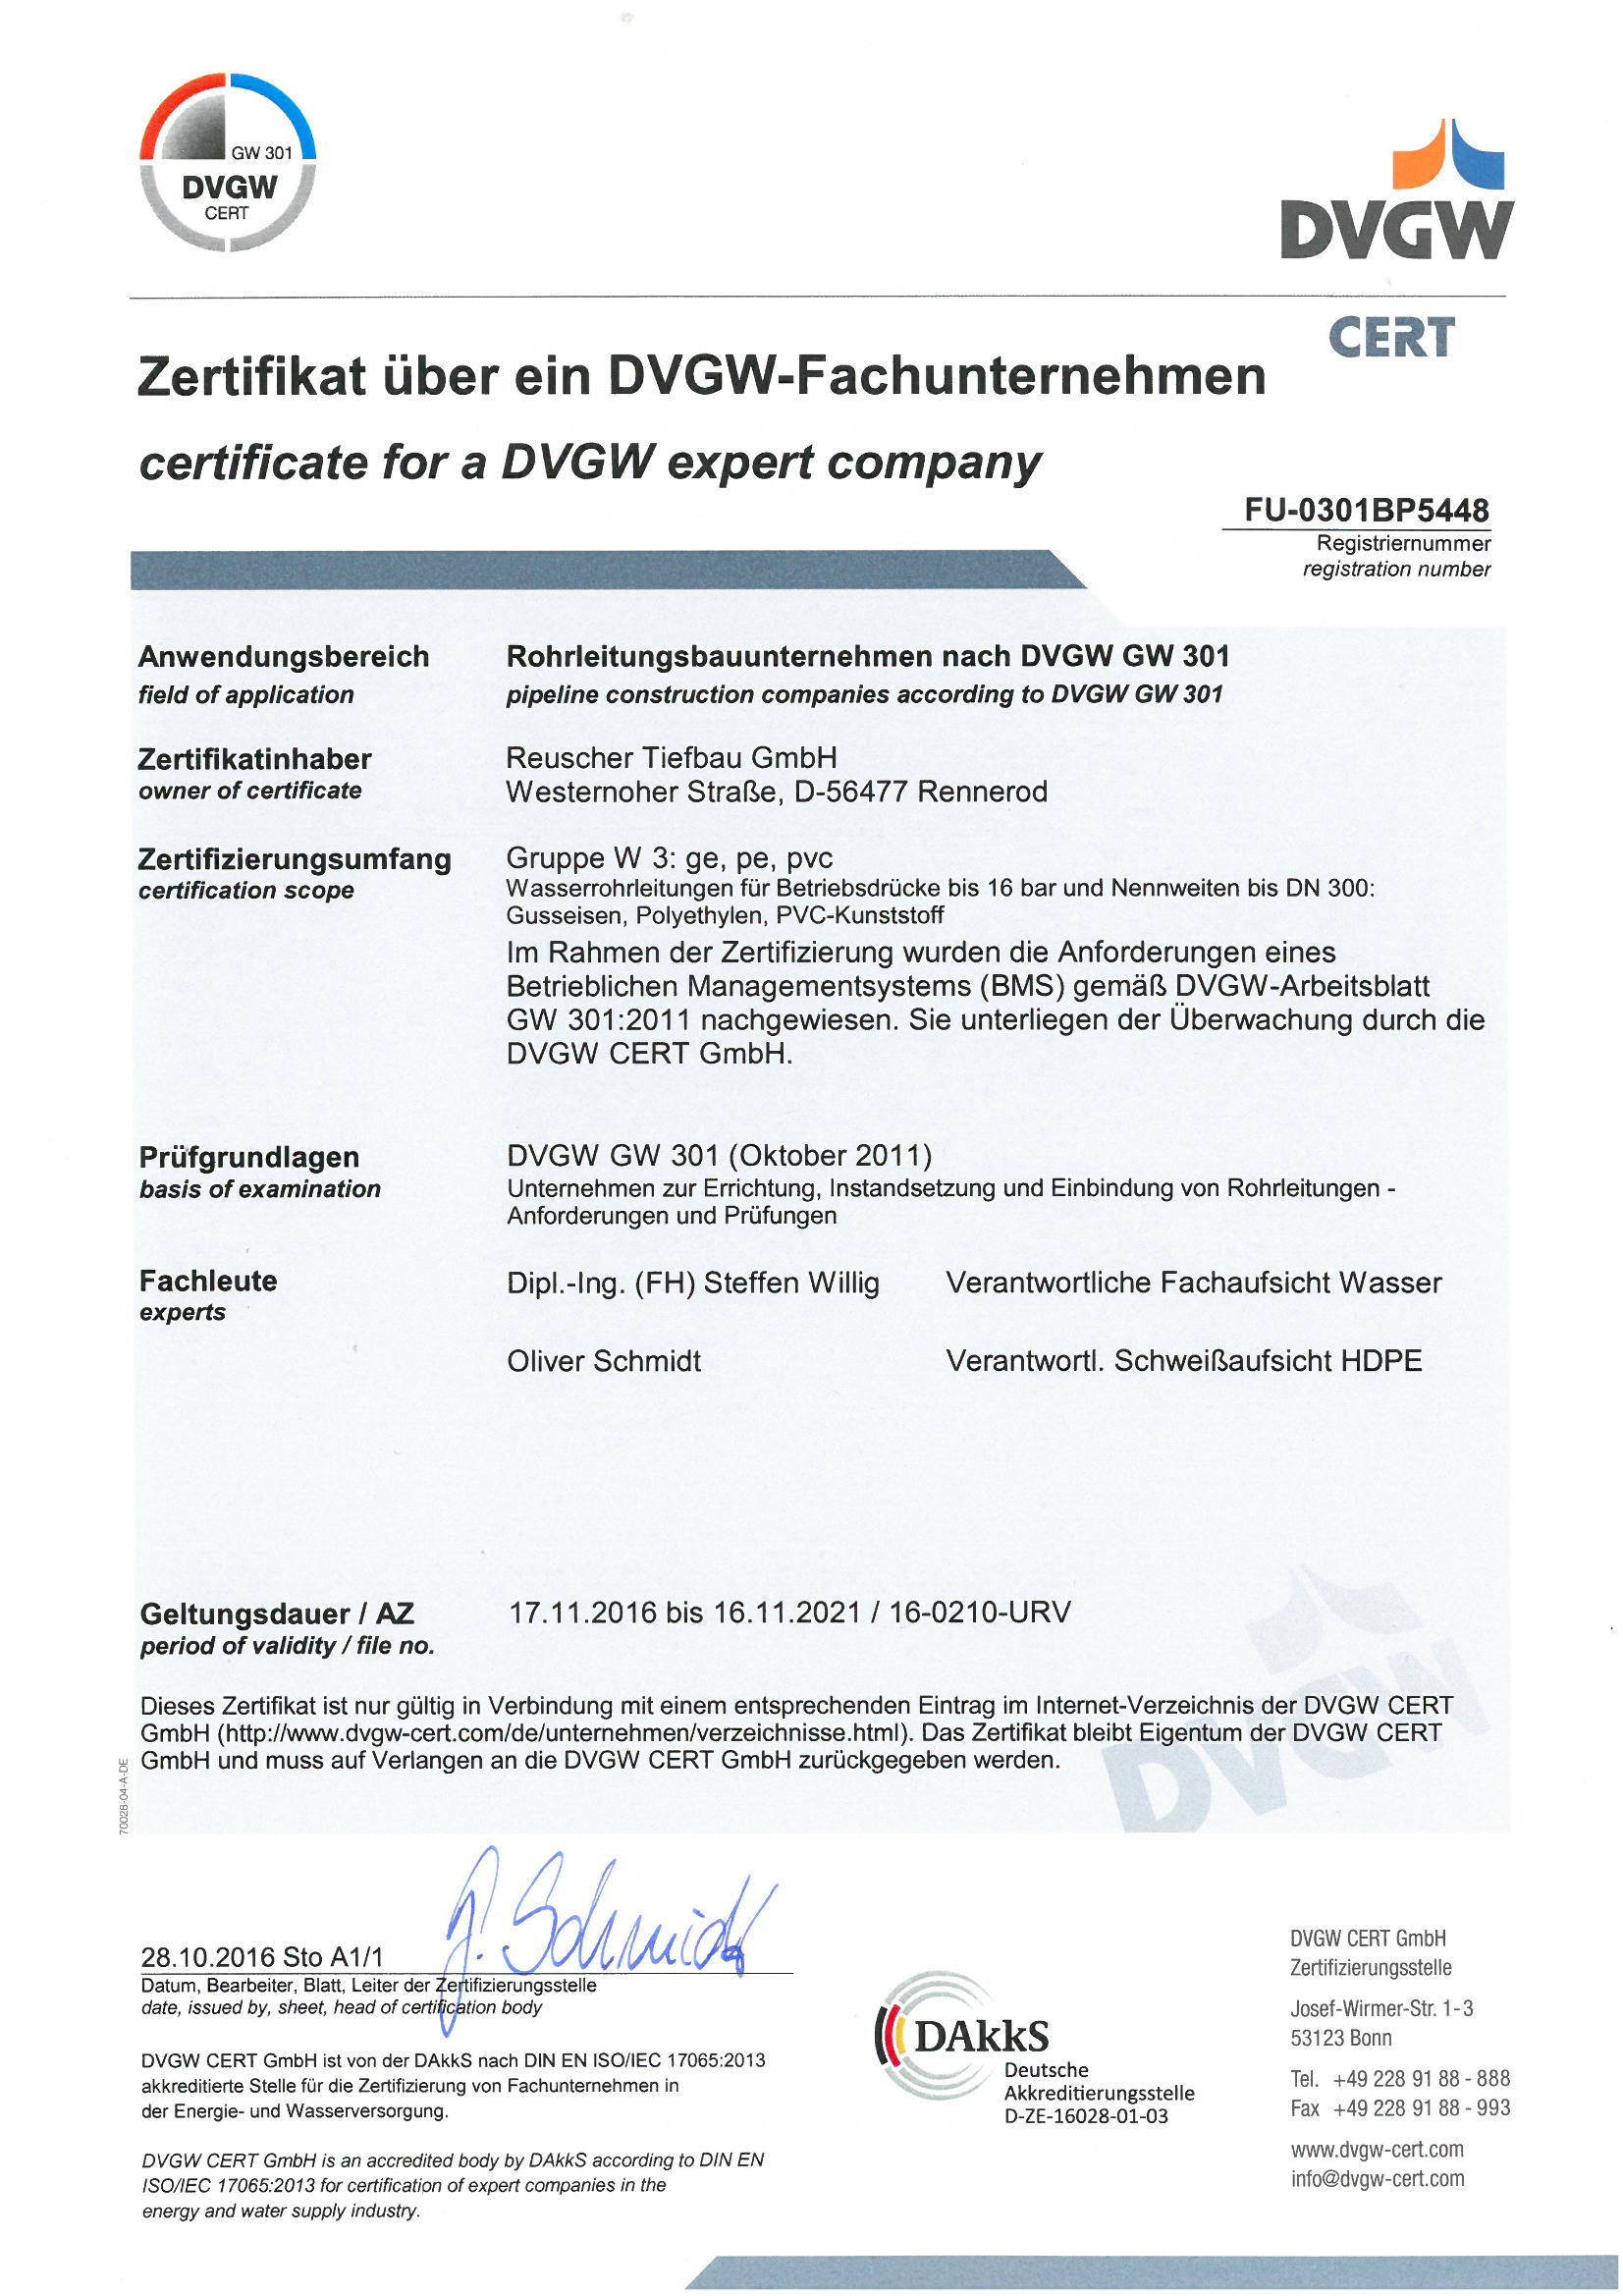 DVGW2016.jpg